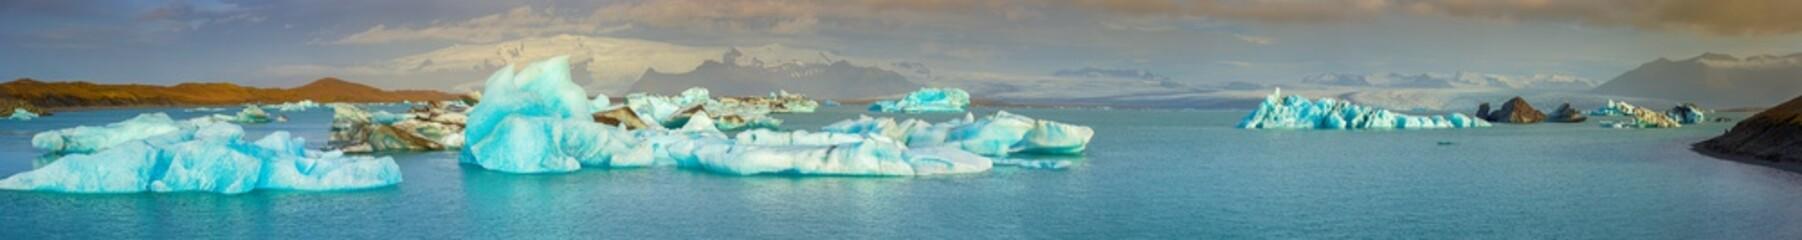 Scenic panorama view of Glacier Lagoon, Jokulsarlon, on South Iceland, Travel Destinations Concept